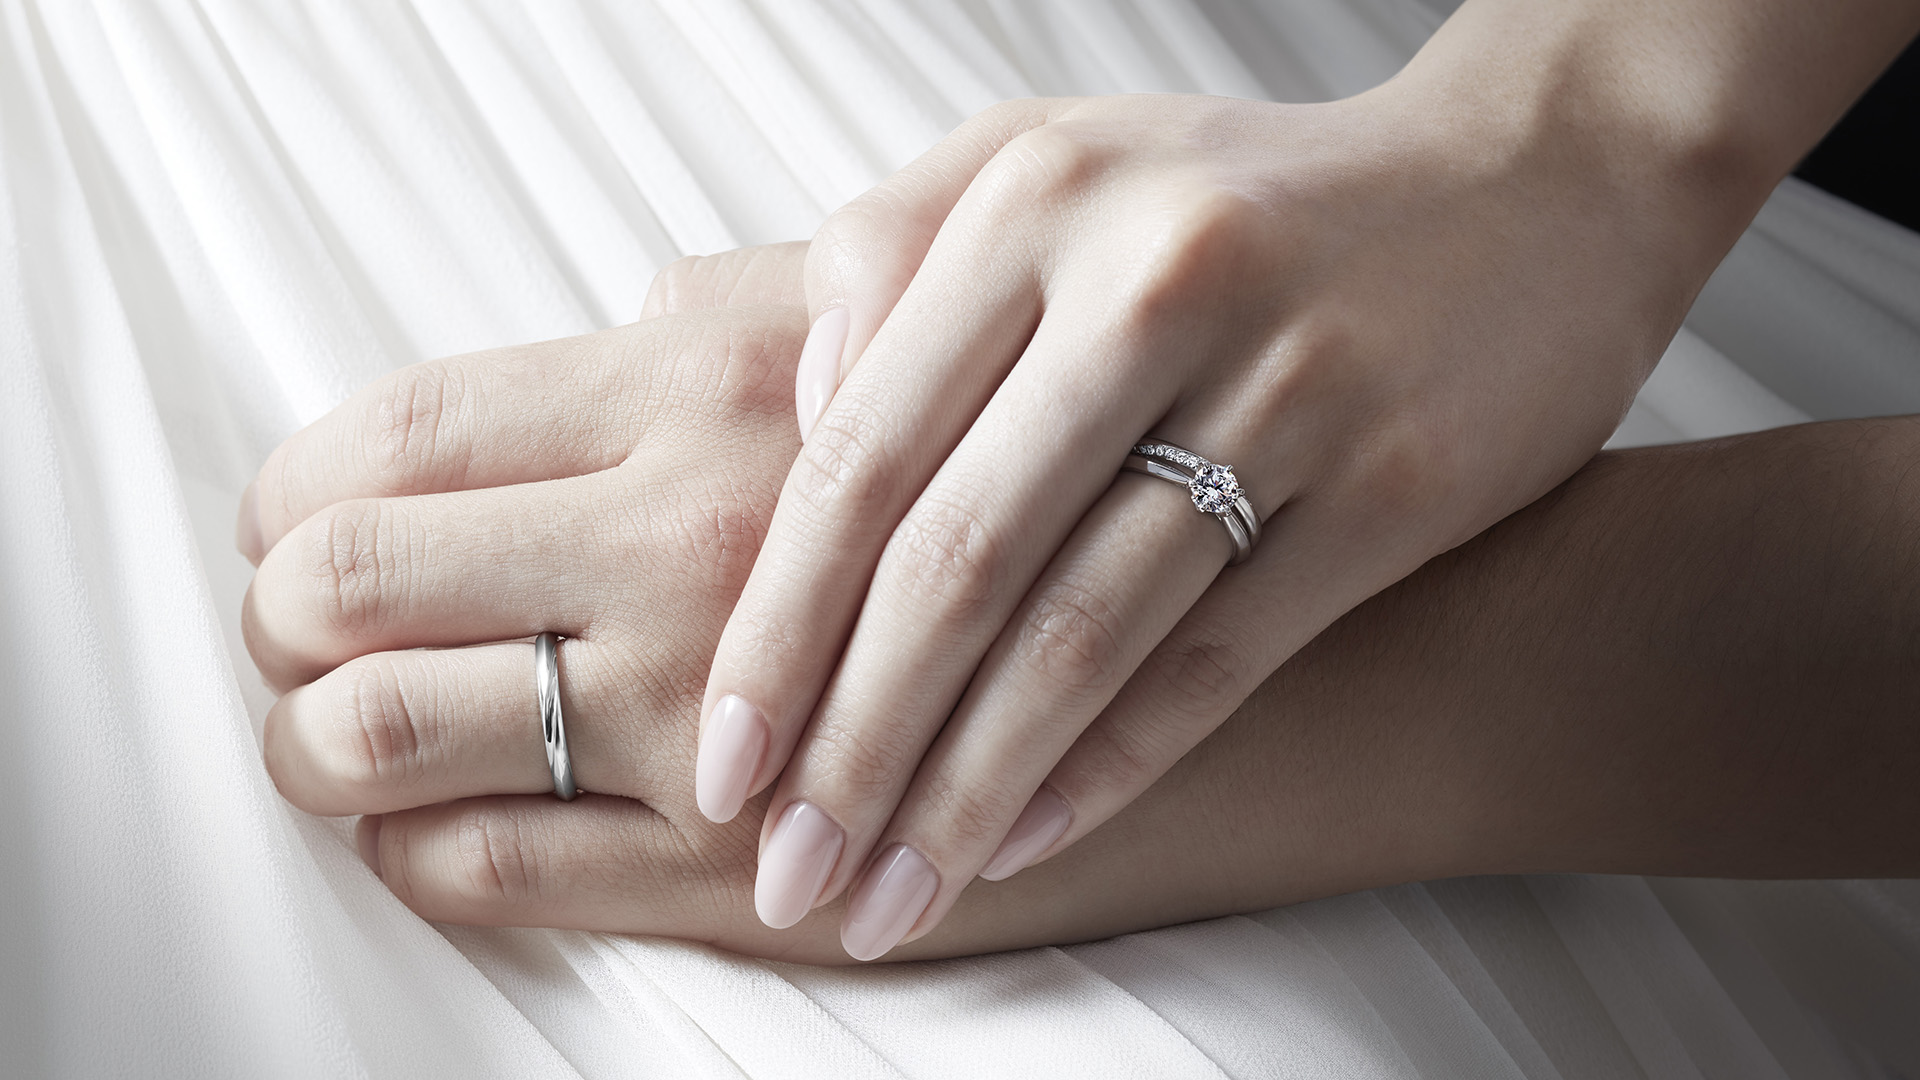 hercules ヘラクレス   結婚指輪